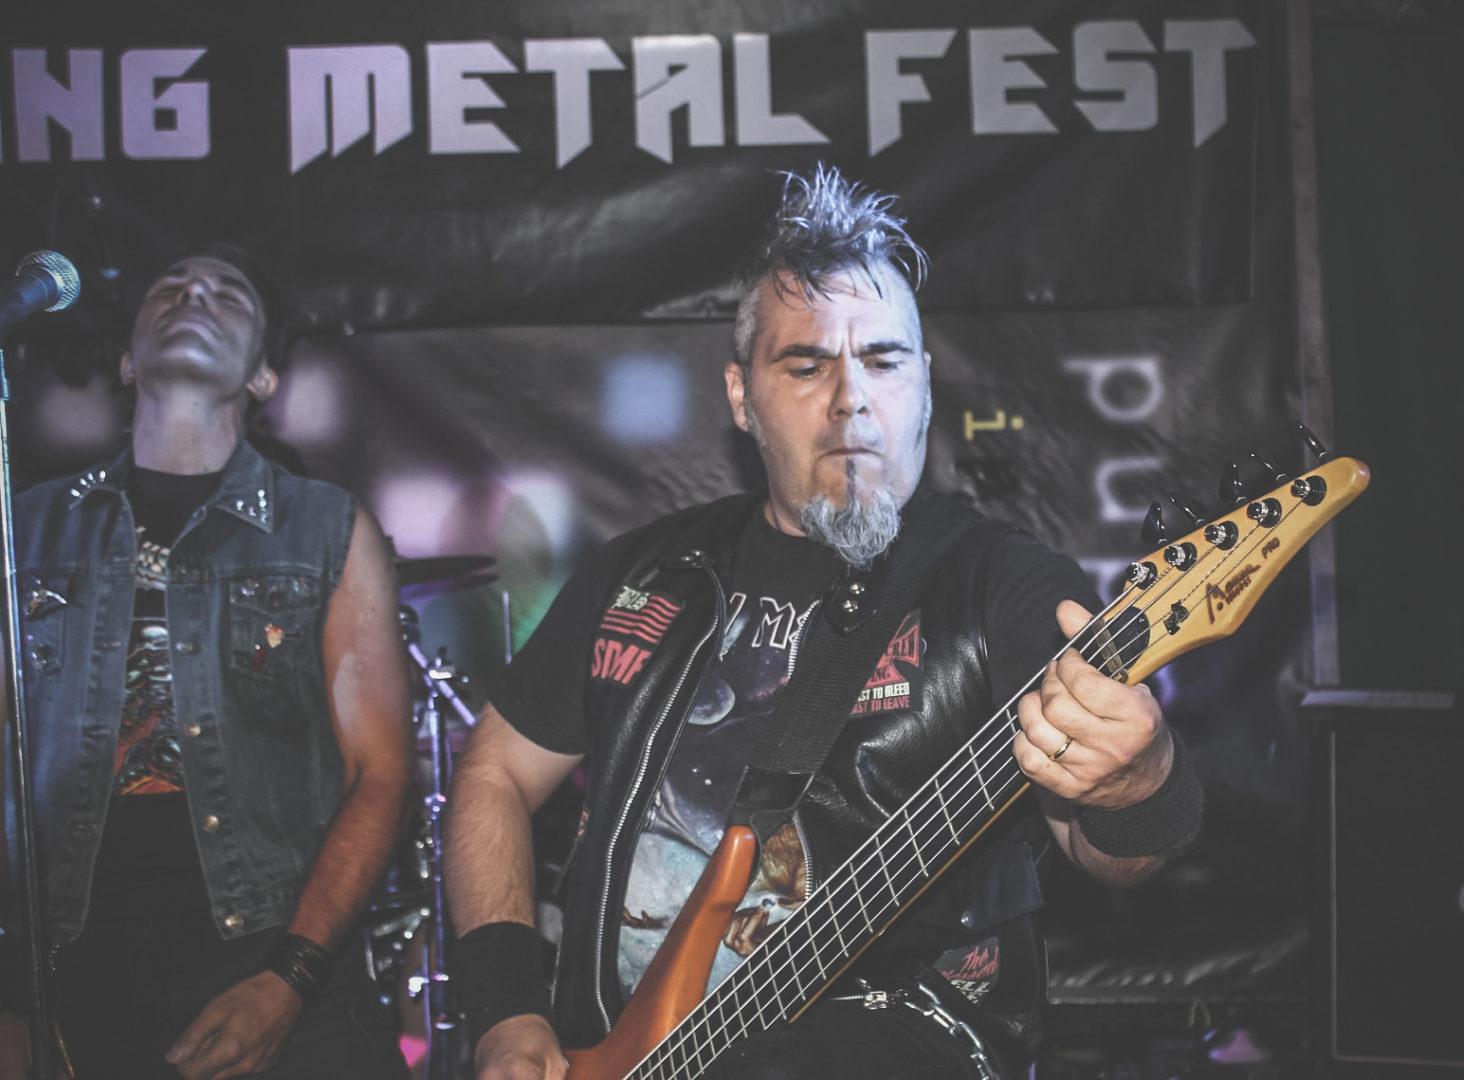 Anguish Force Atzwang Metal Fest 2019 24 - Atzwang Metal Fest 9 - live